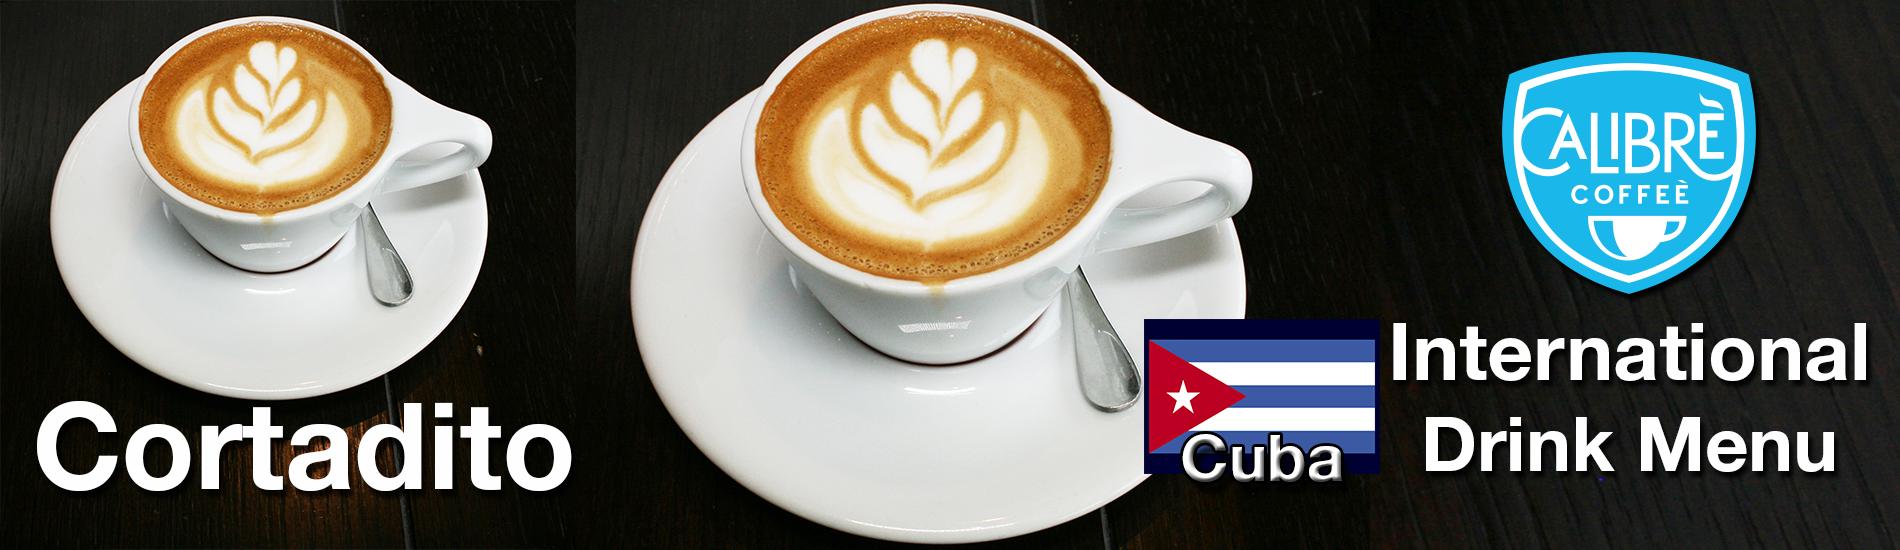 calibre-coffee-slides-international-coffee-Cortadito